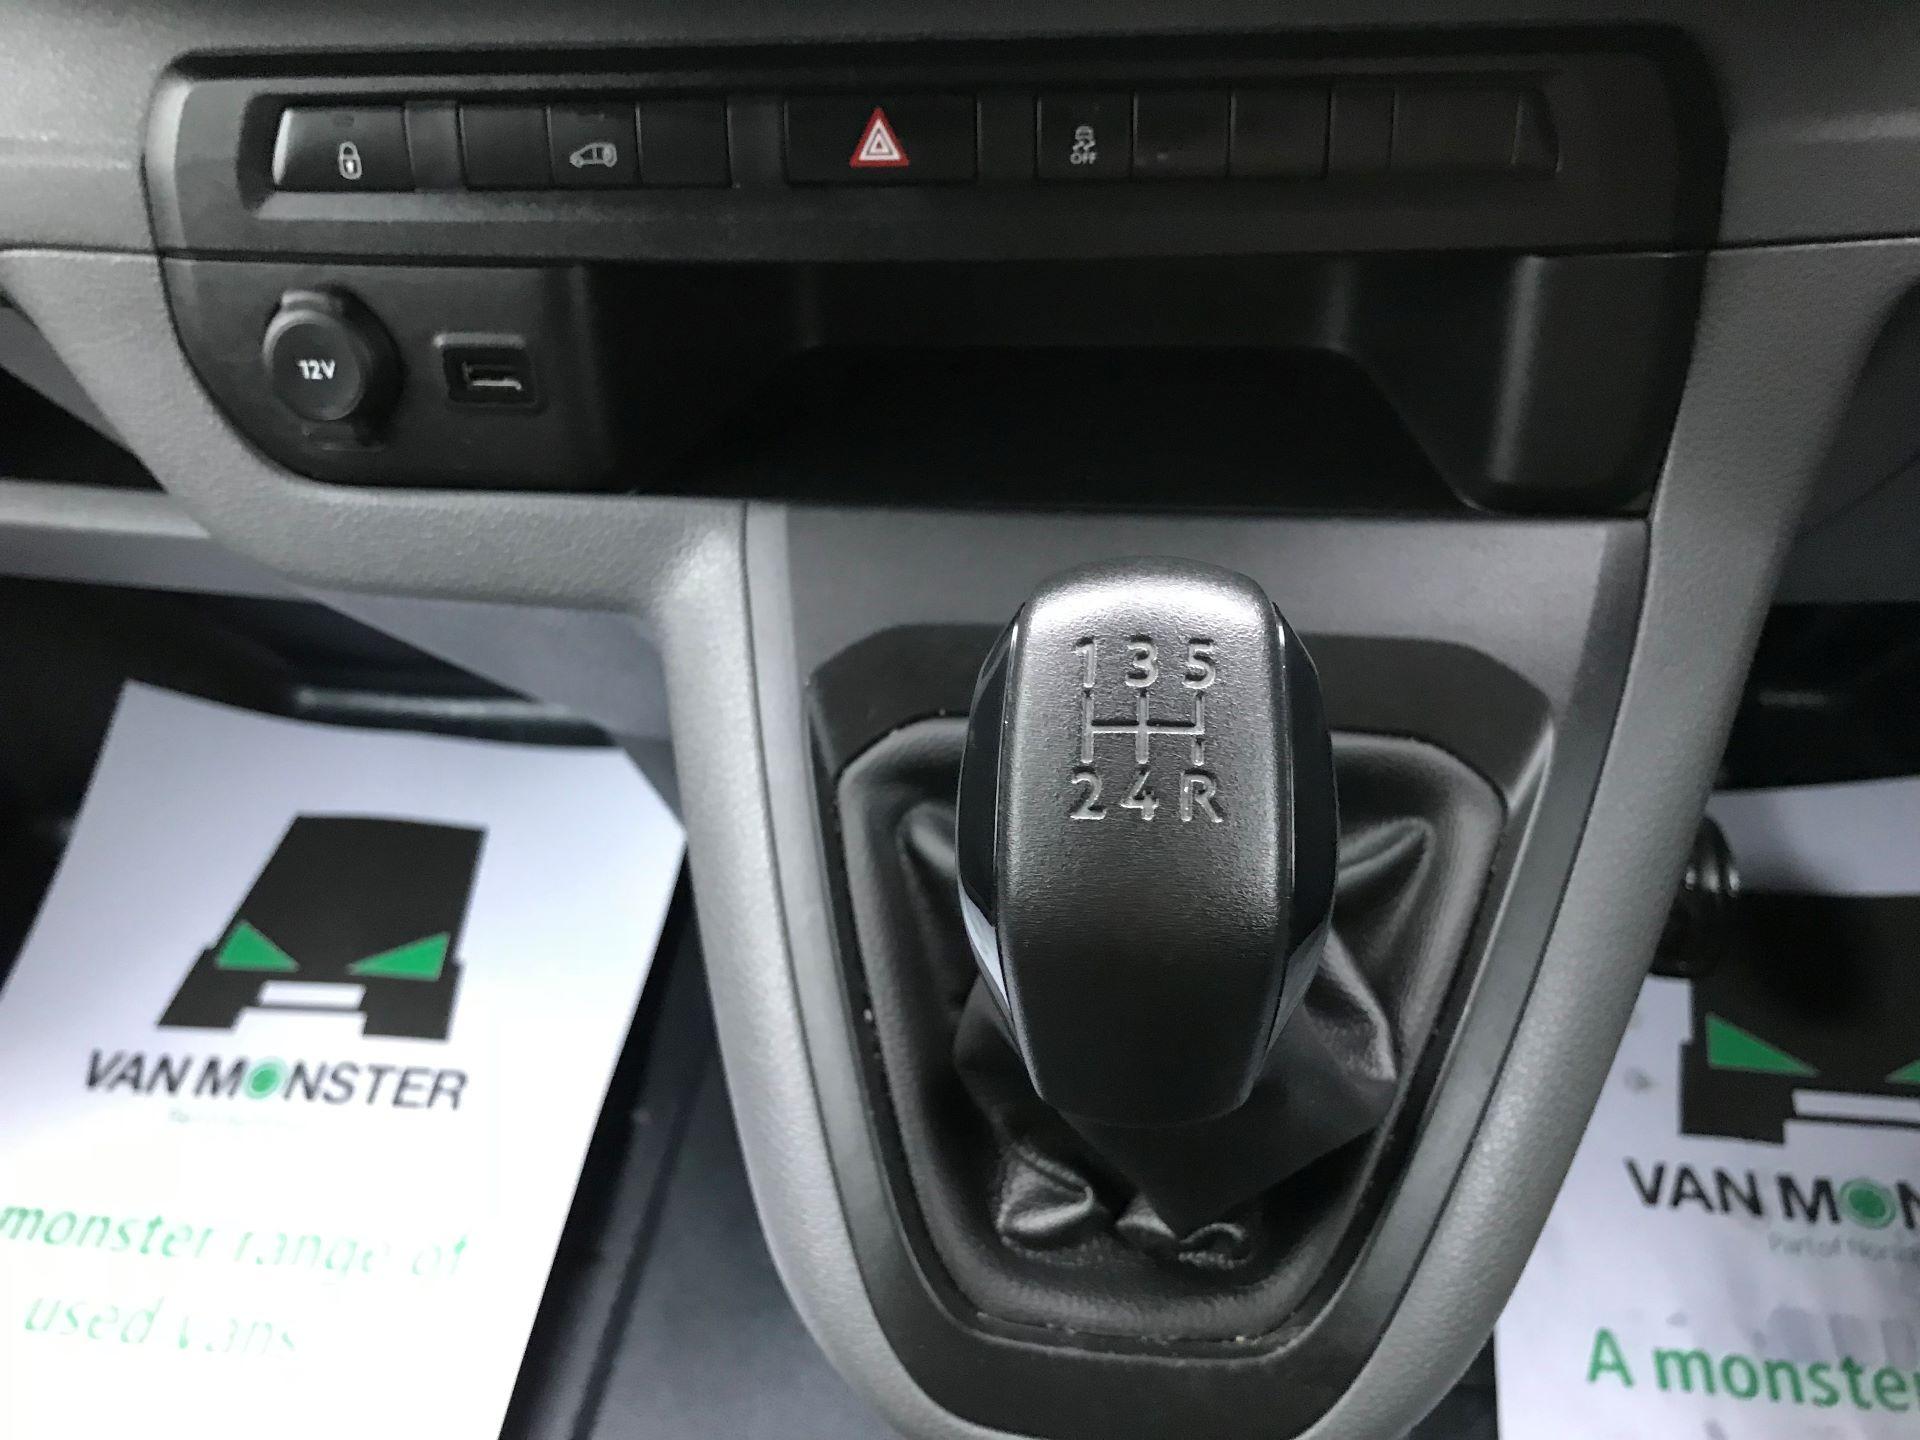 2018 Peugeot Expert STANDARD 1000 1.6 BLUEHDI 95 PROFESSIONAL EURO 6 (NU18VXF) Image 22